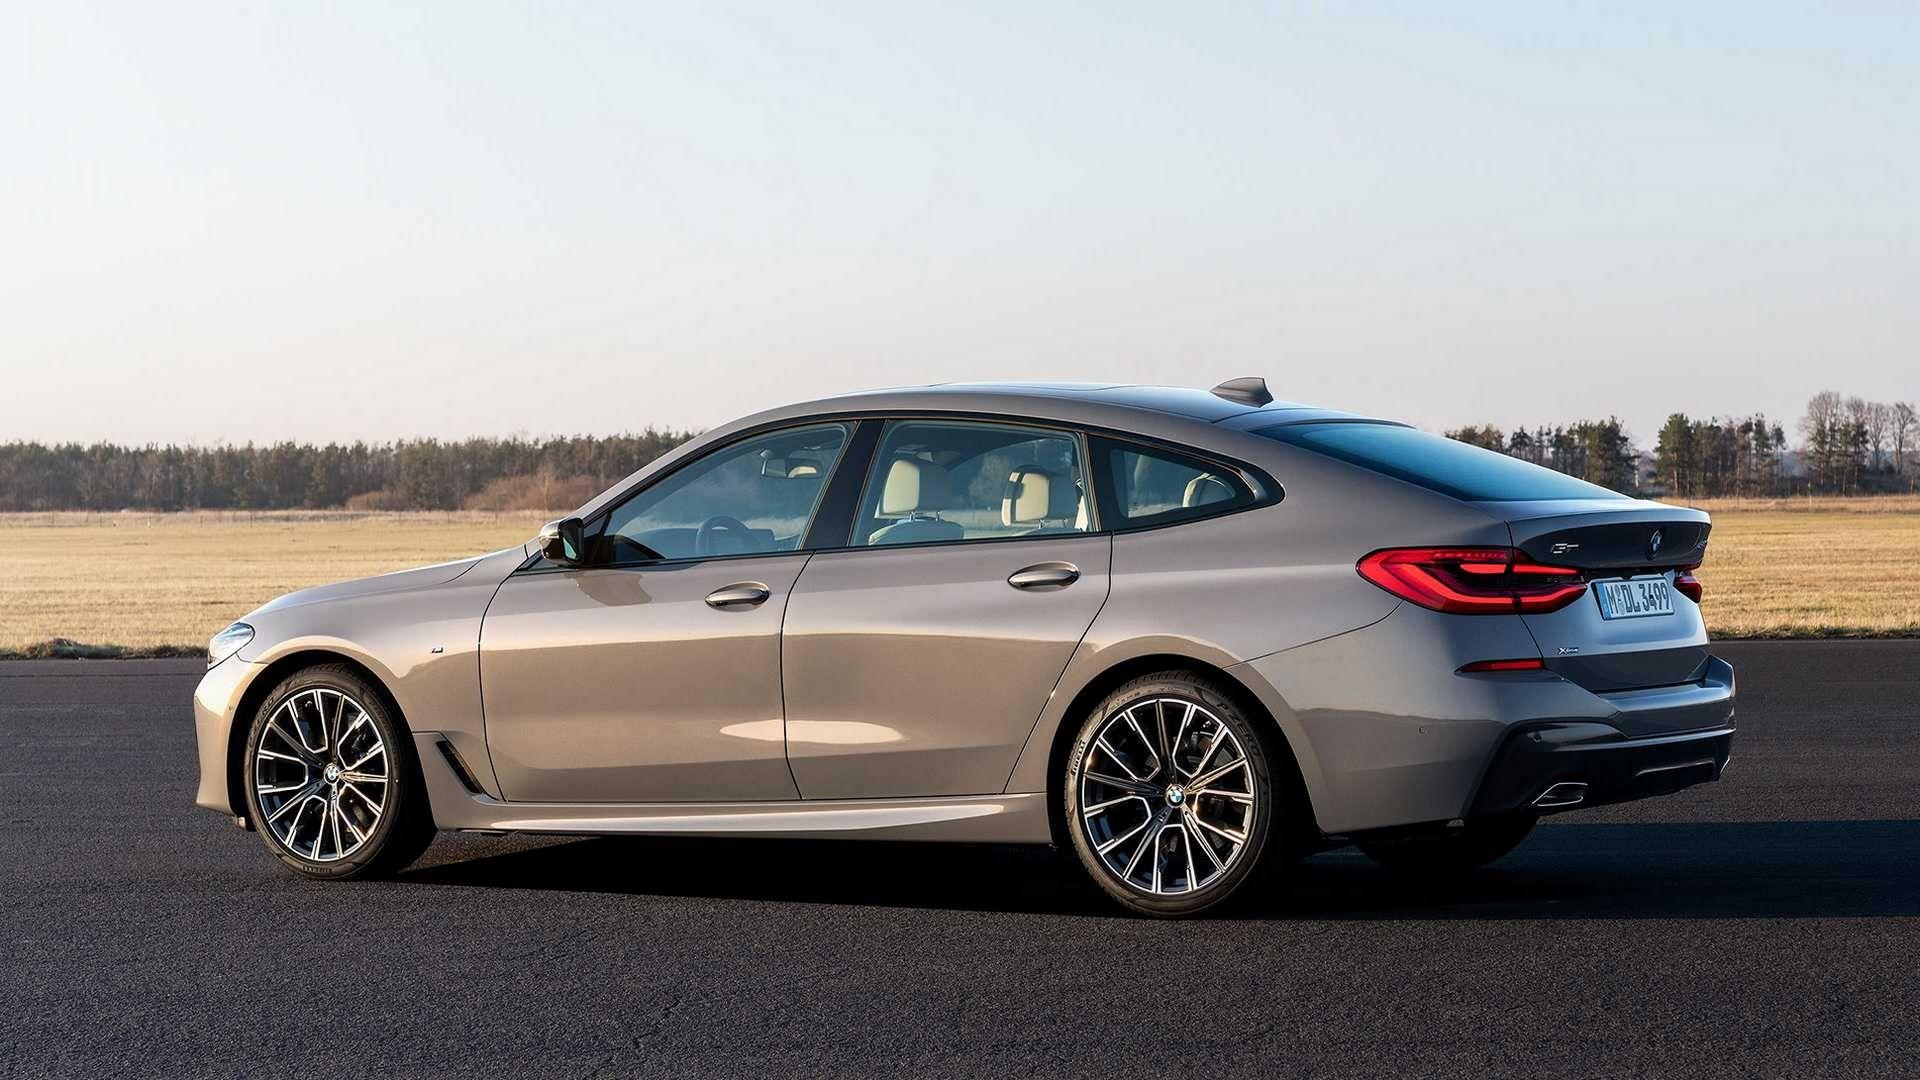 BMW-6-Series-GT-Gran-Turismo-facelift-2021-3